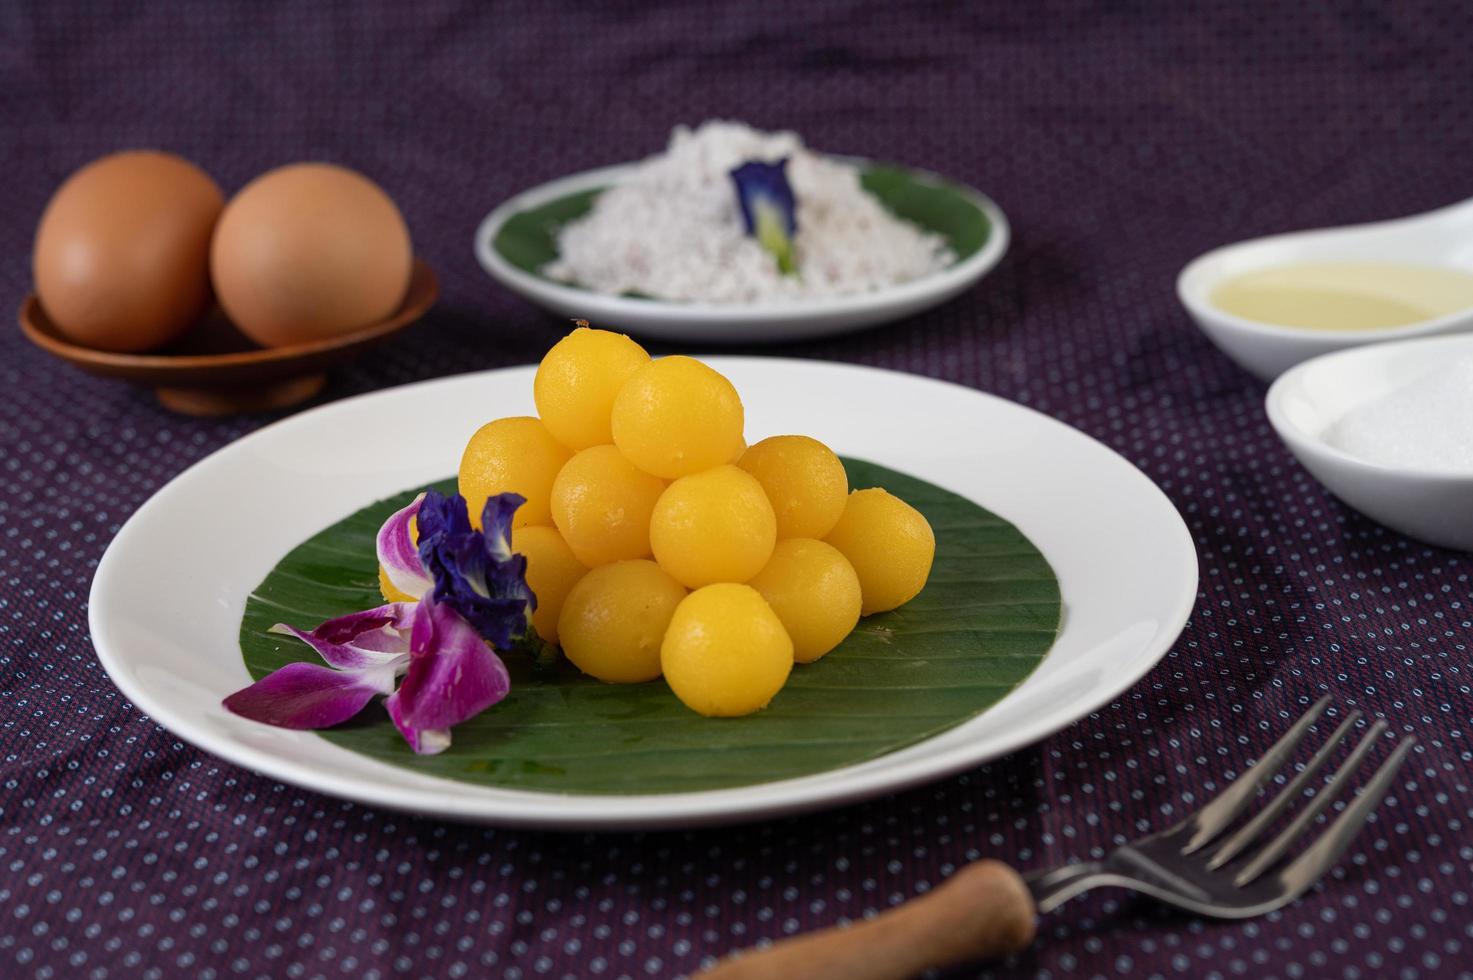 Thong yod, dessert thaï sur une feuille de bananier photo